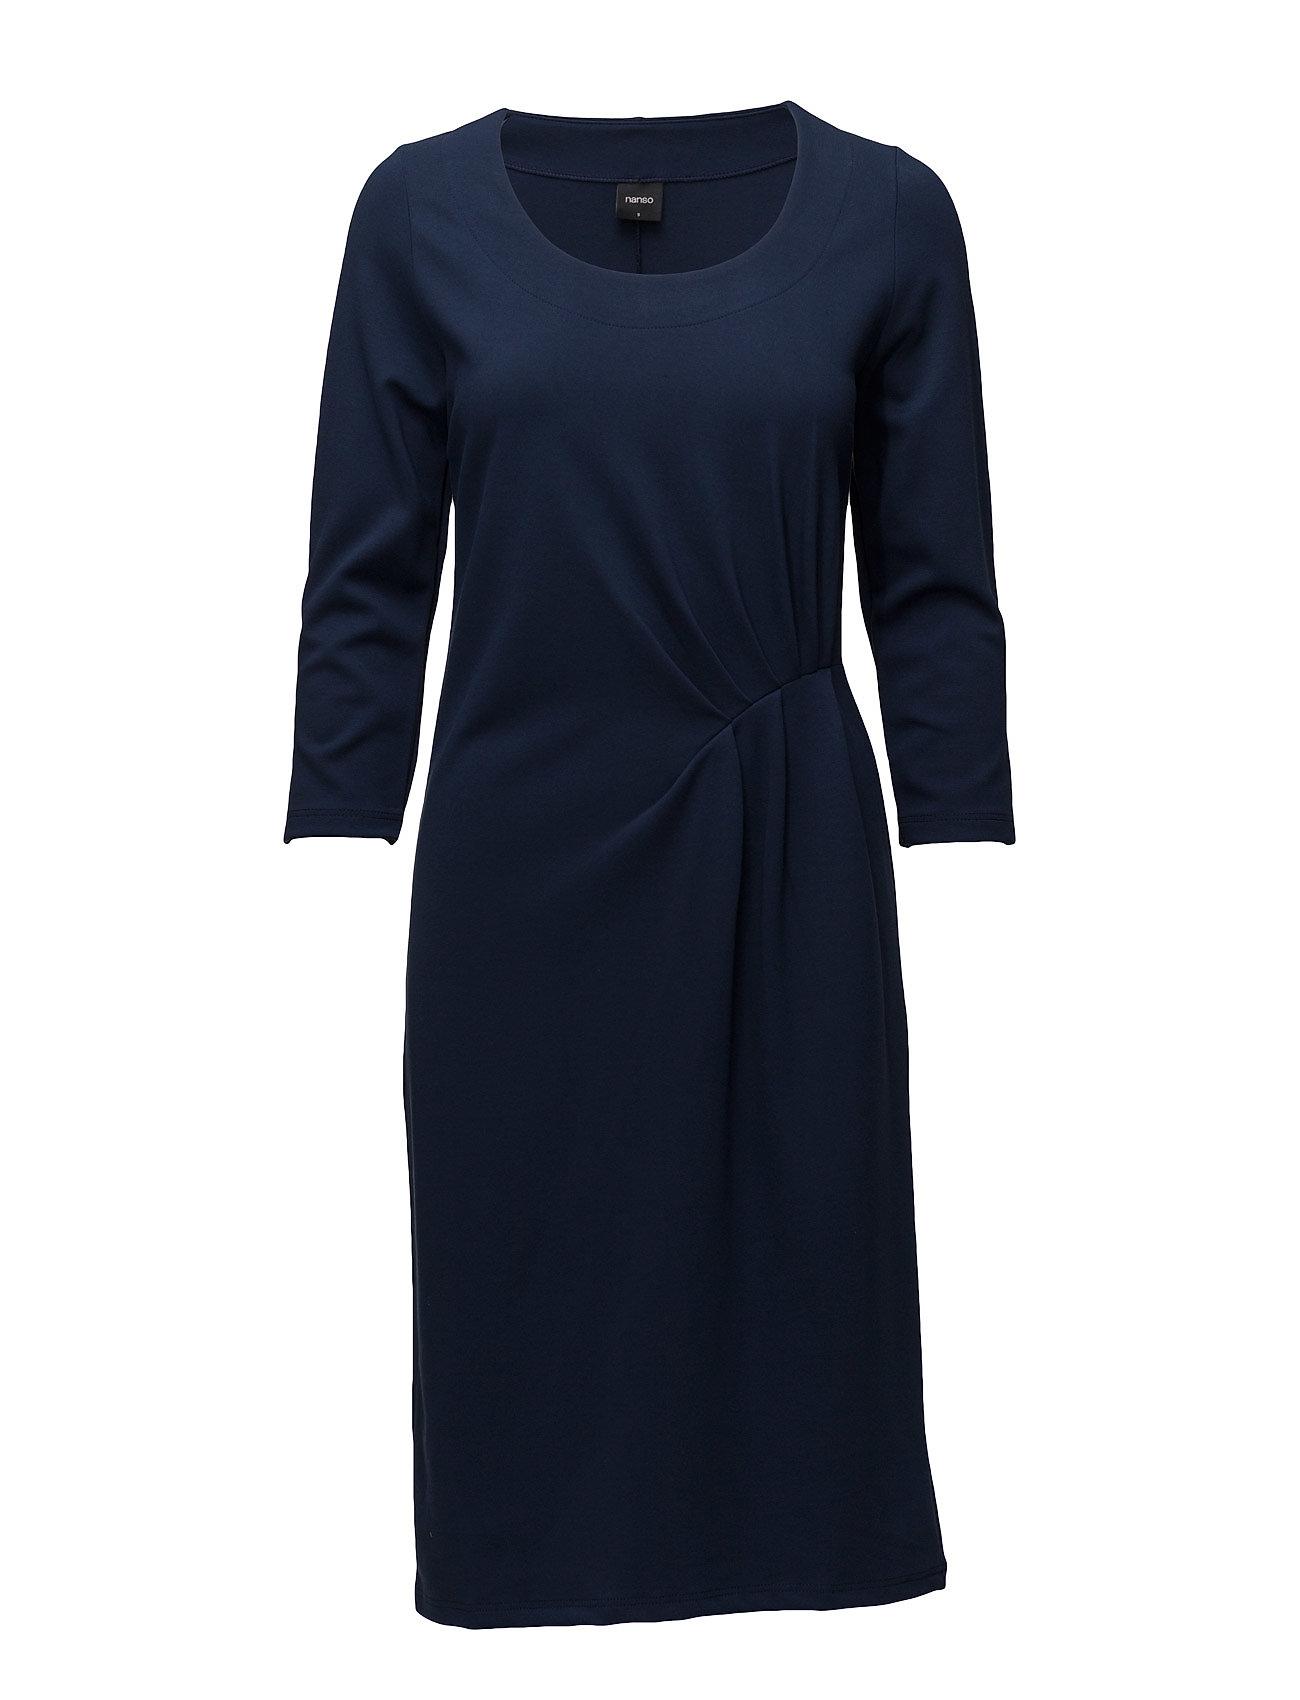 Ladies dress, kuulas fra nanso på boozt.com dk